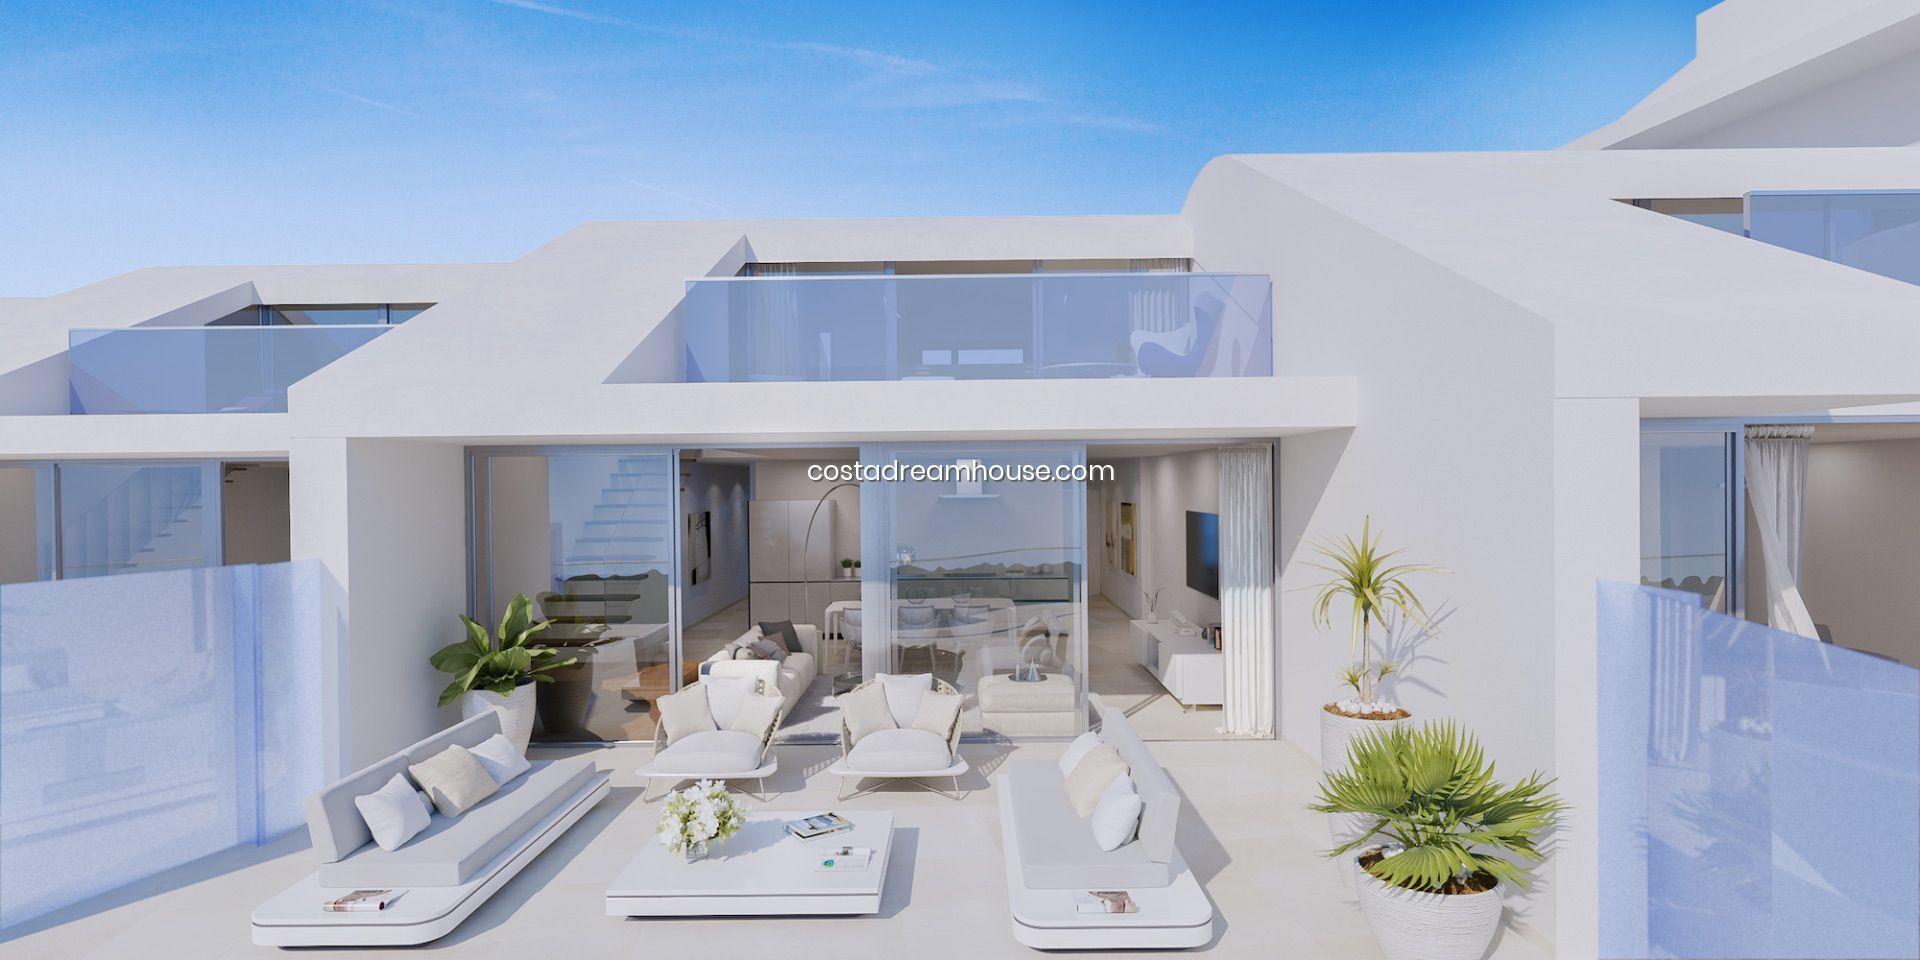 New Development Of Apartments In Benalmádena